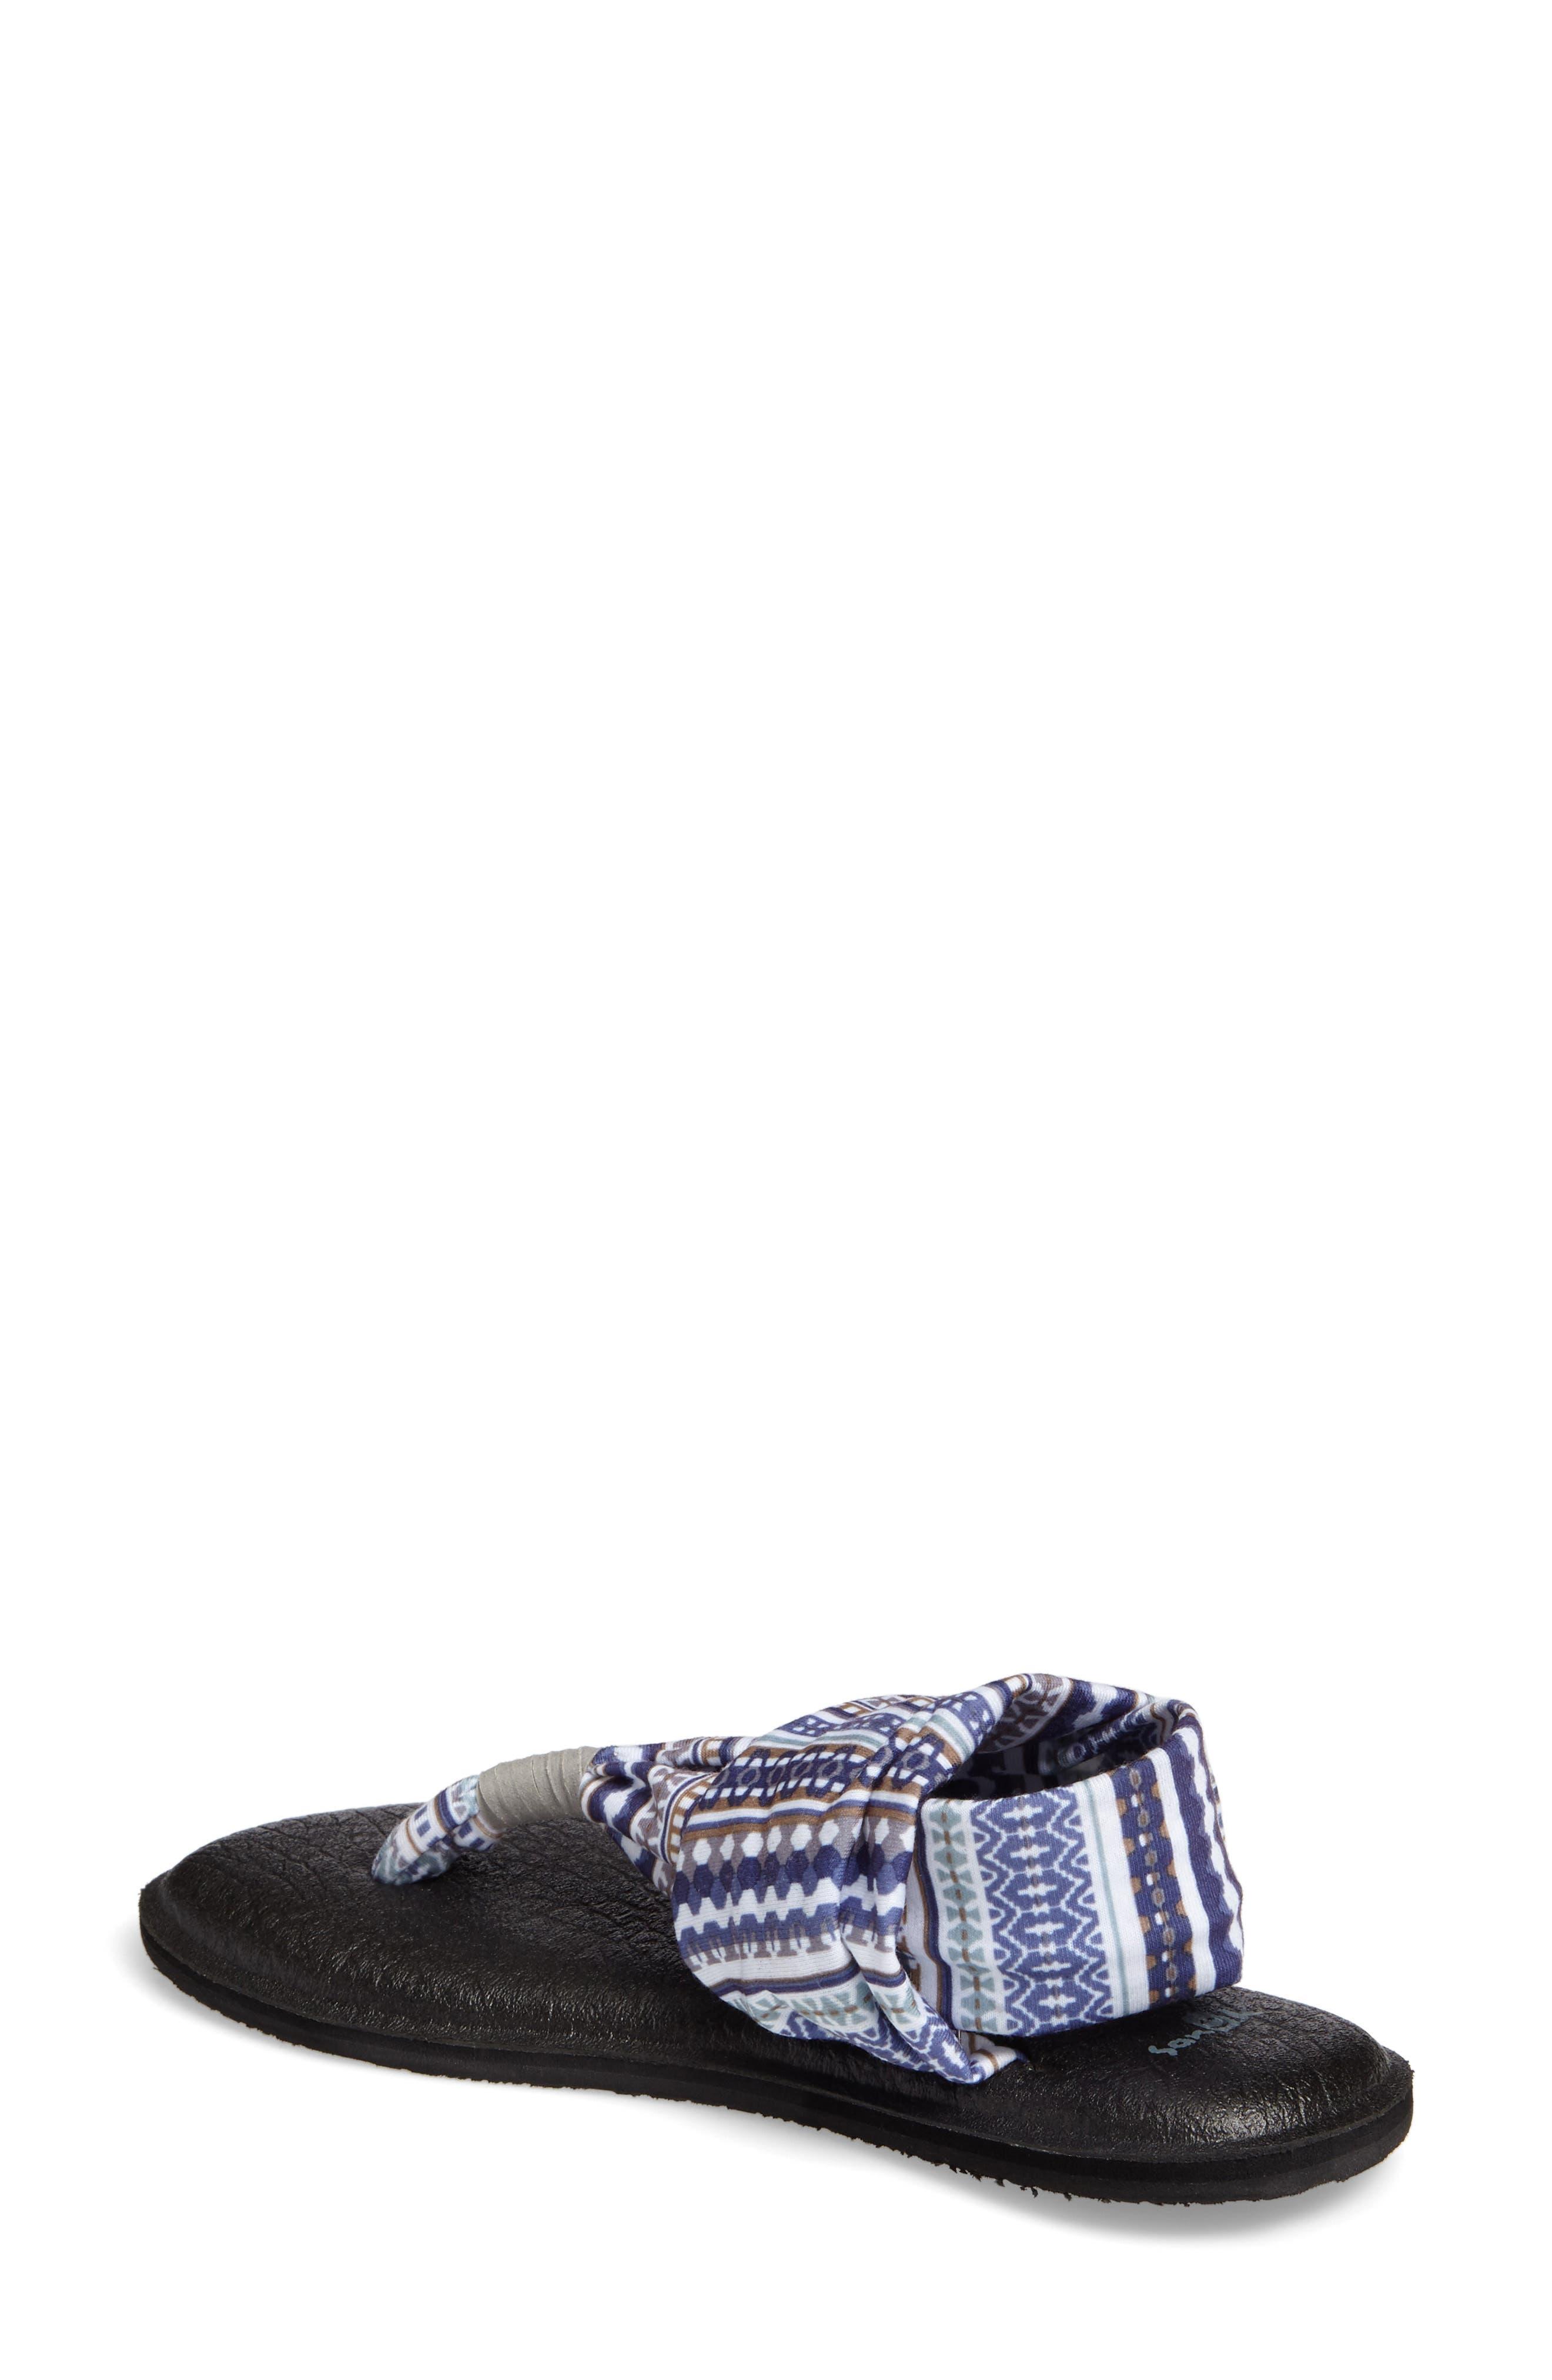 'Yoga Sling 2' Sandal,                             Alternate thumbnail 43, color,